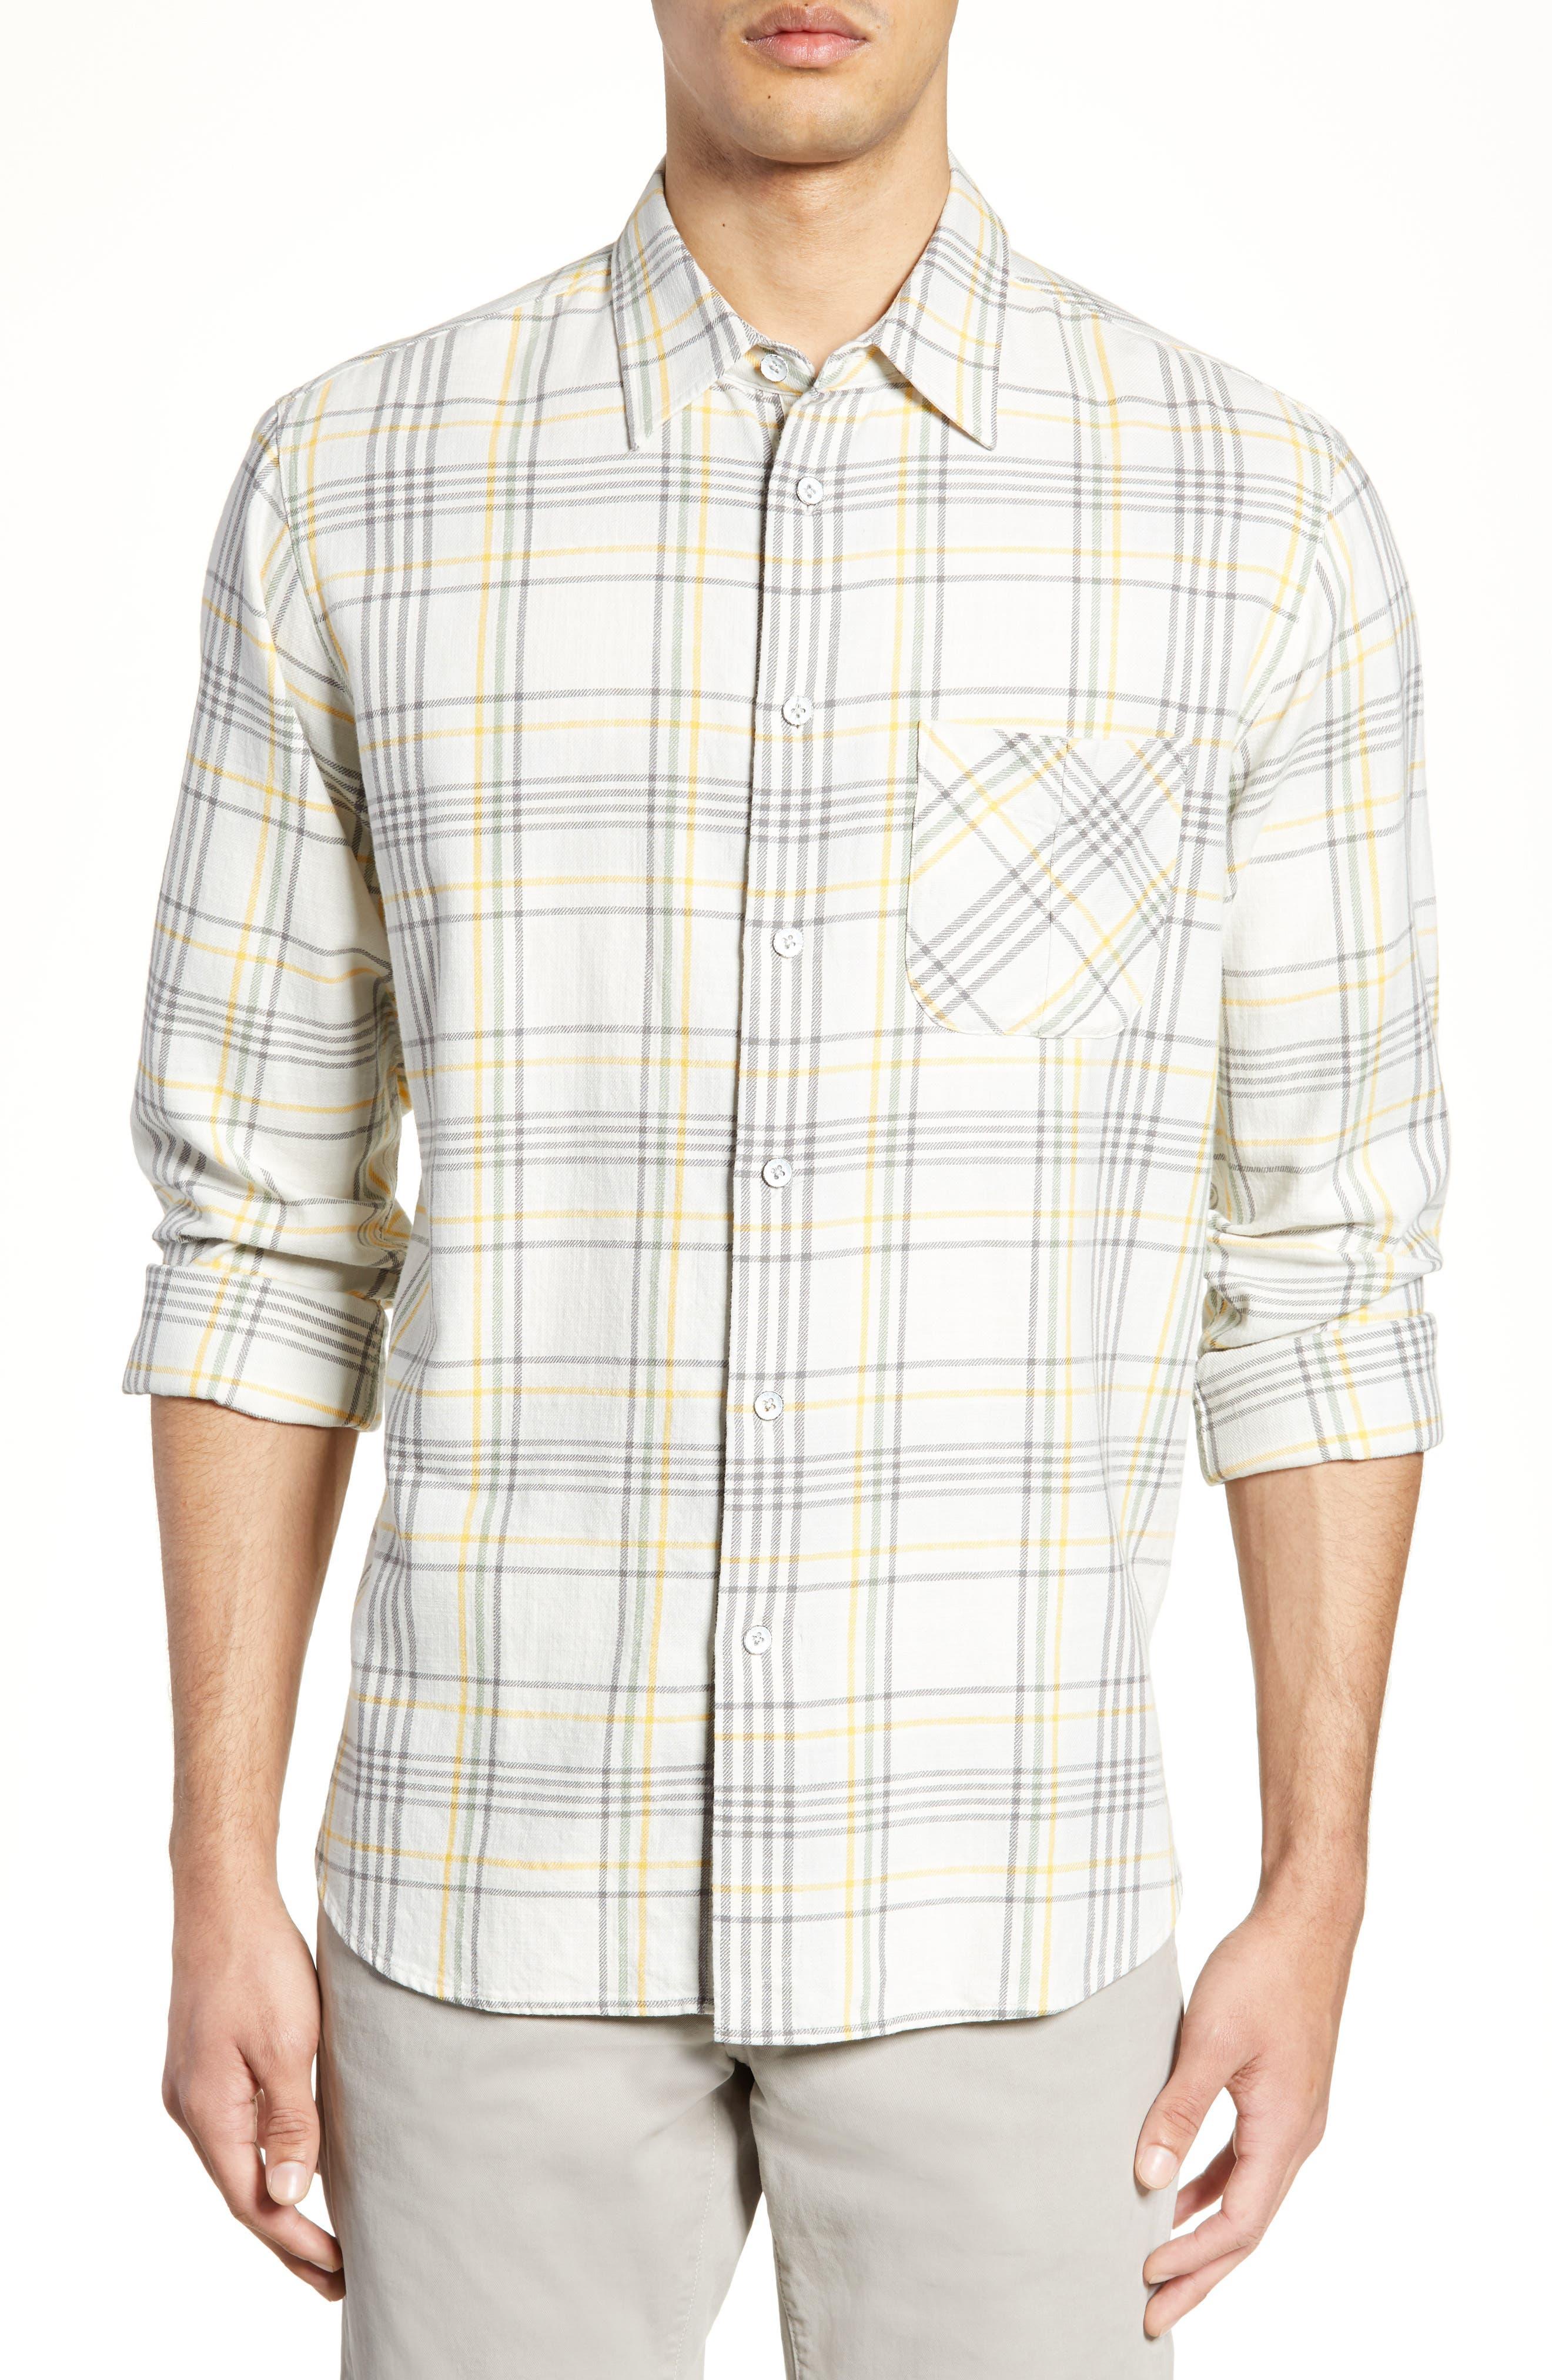 Rag & Bone Fit 3 Regular Fit Beach Shirt, Ivory